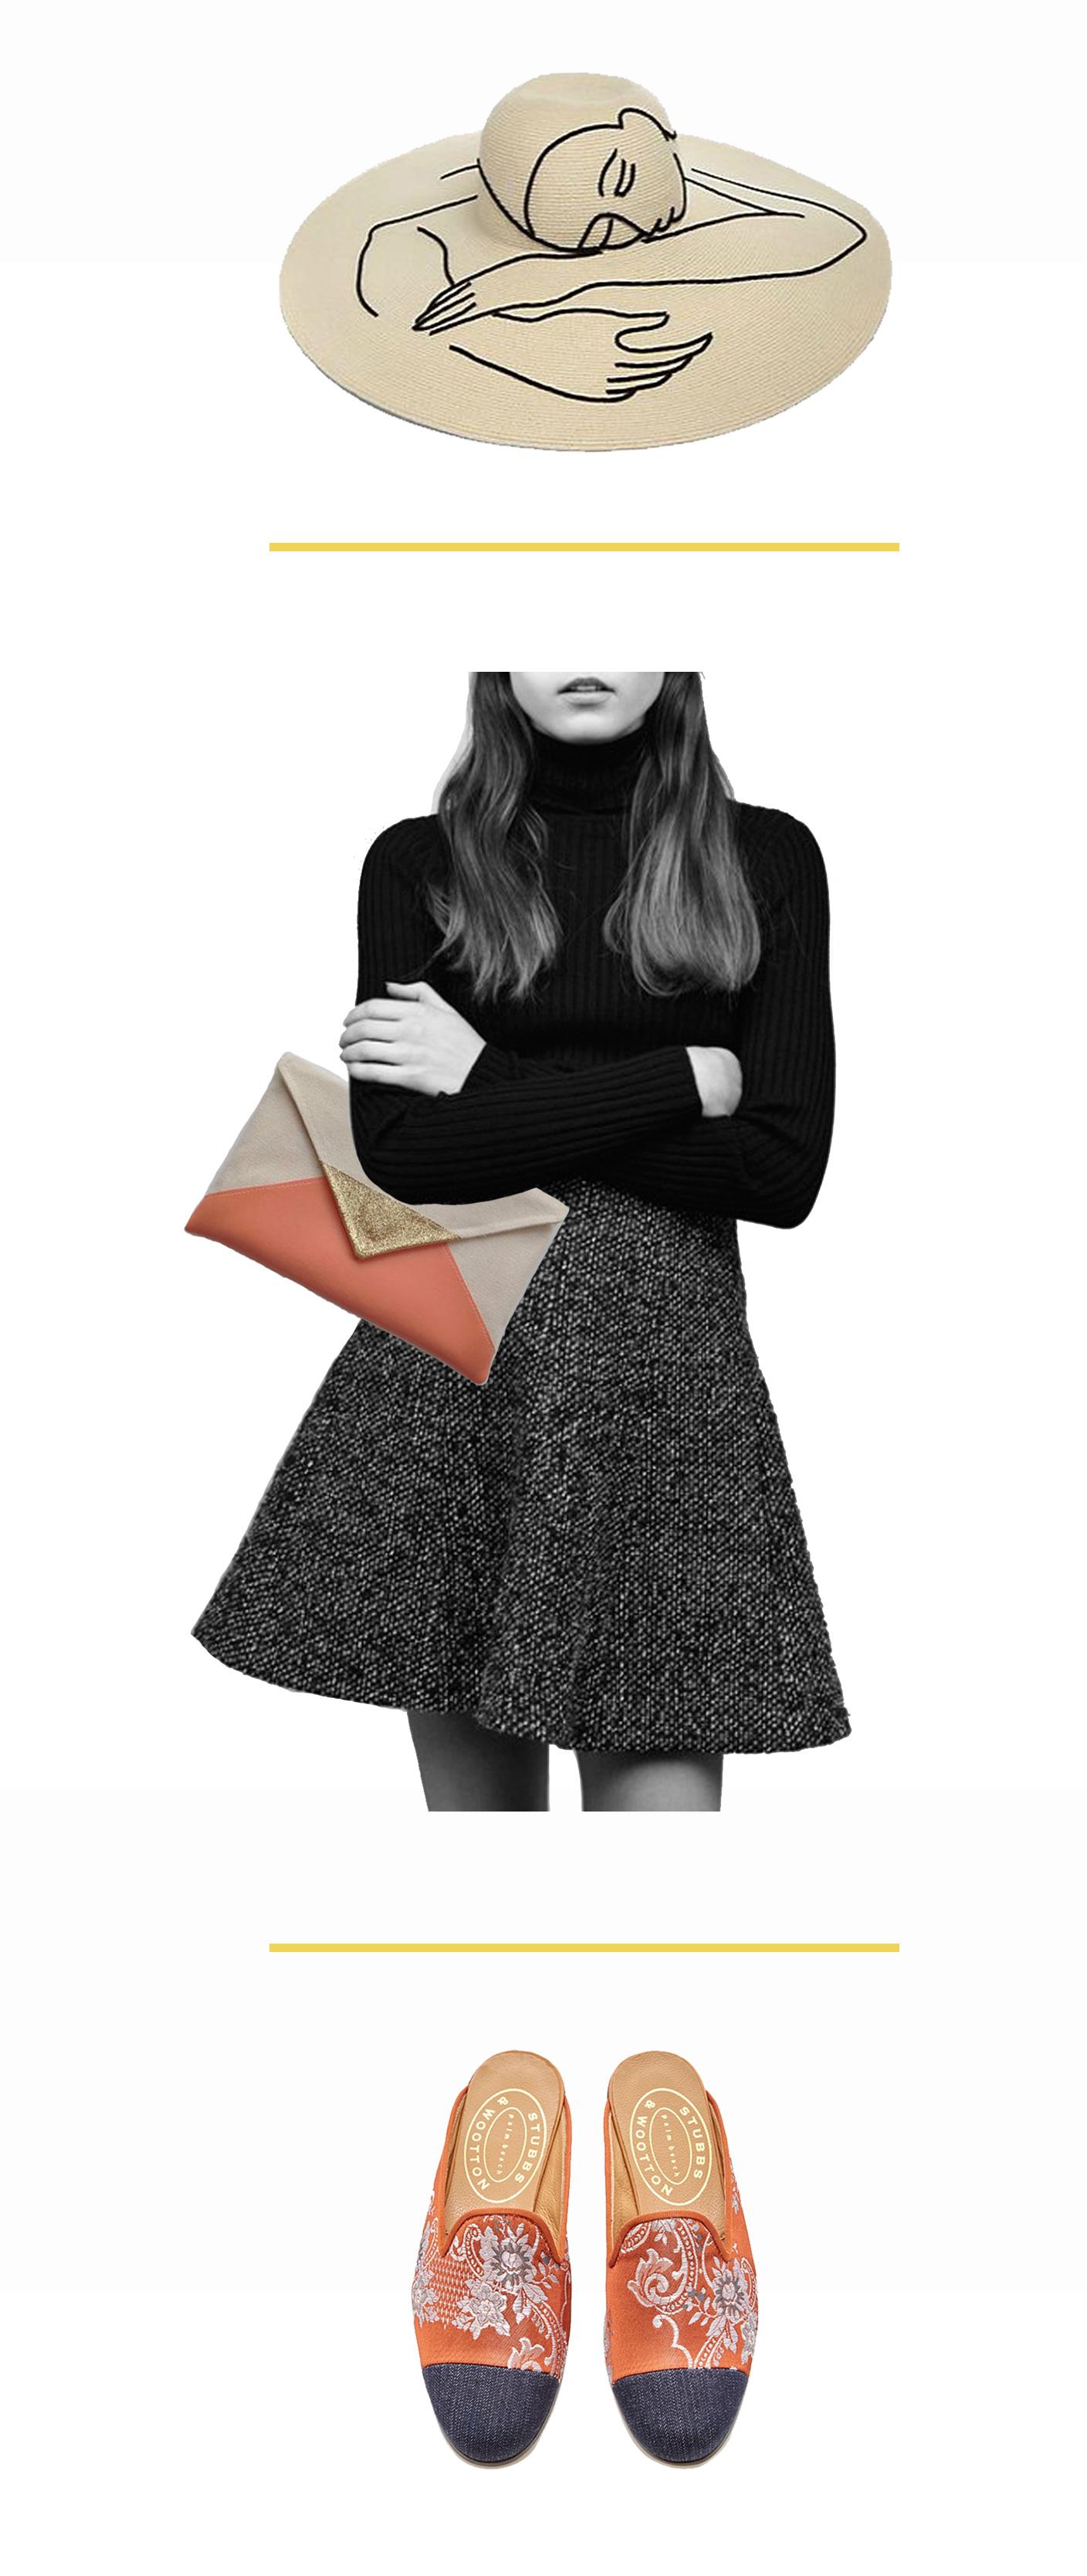 how miss prints wears a floppy hat   @themissprints